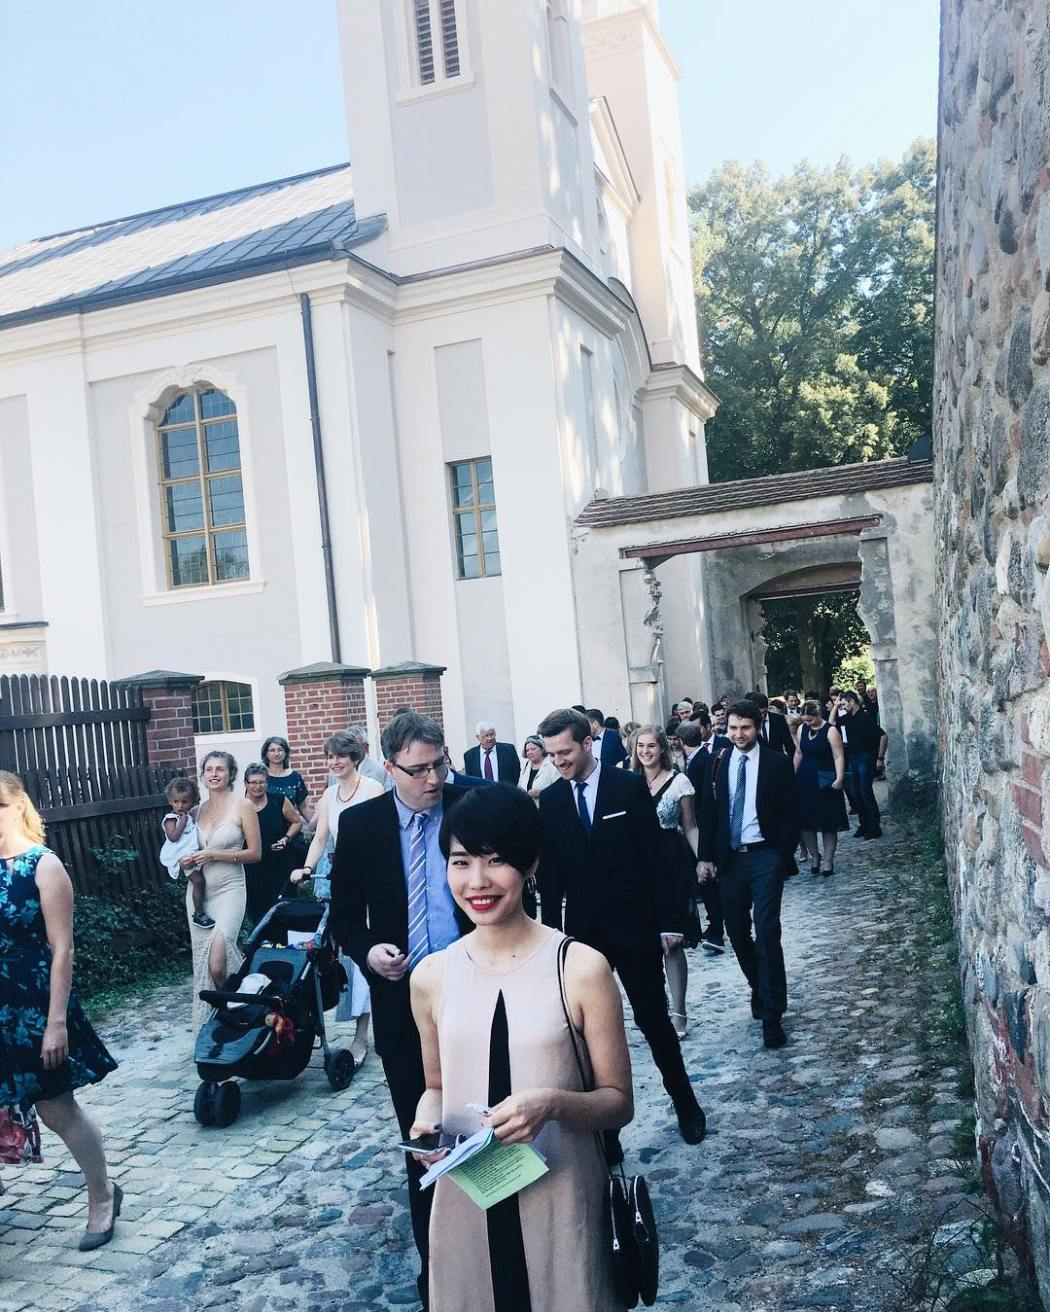 anais_wedding_germany_02